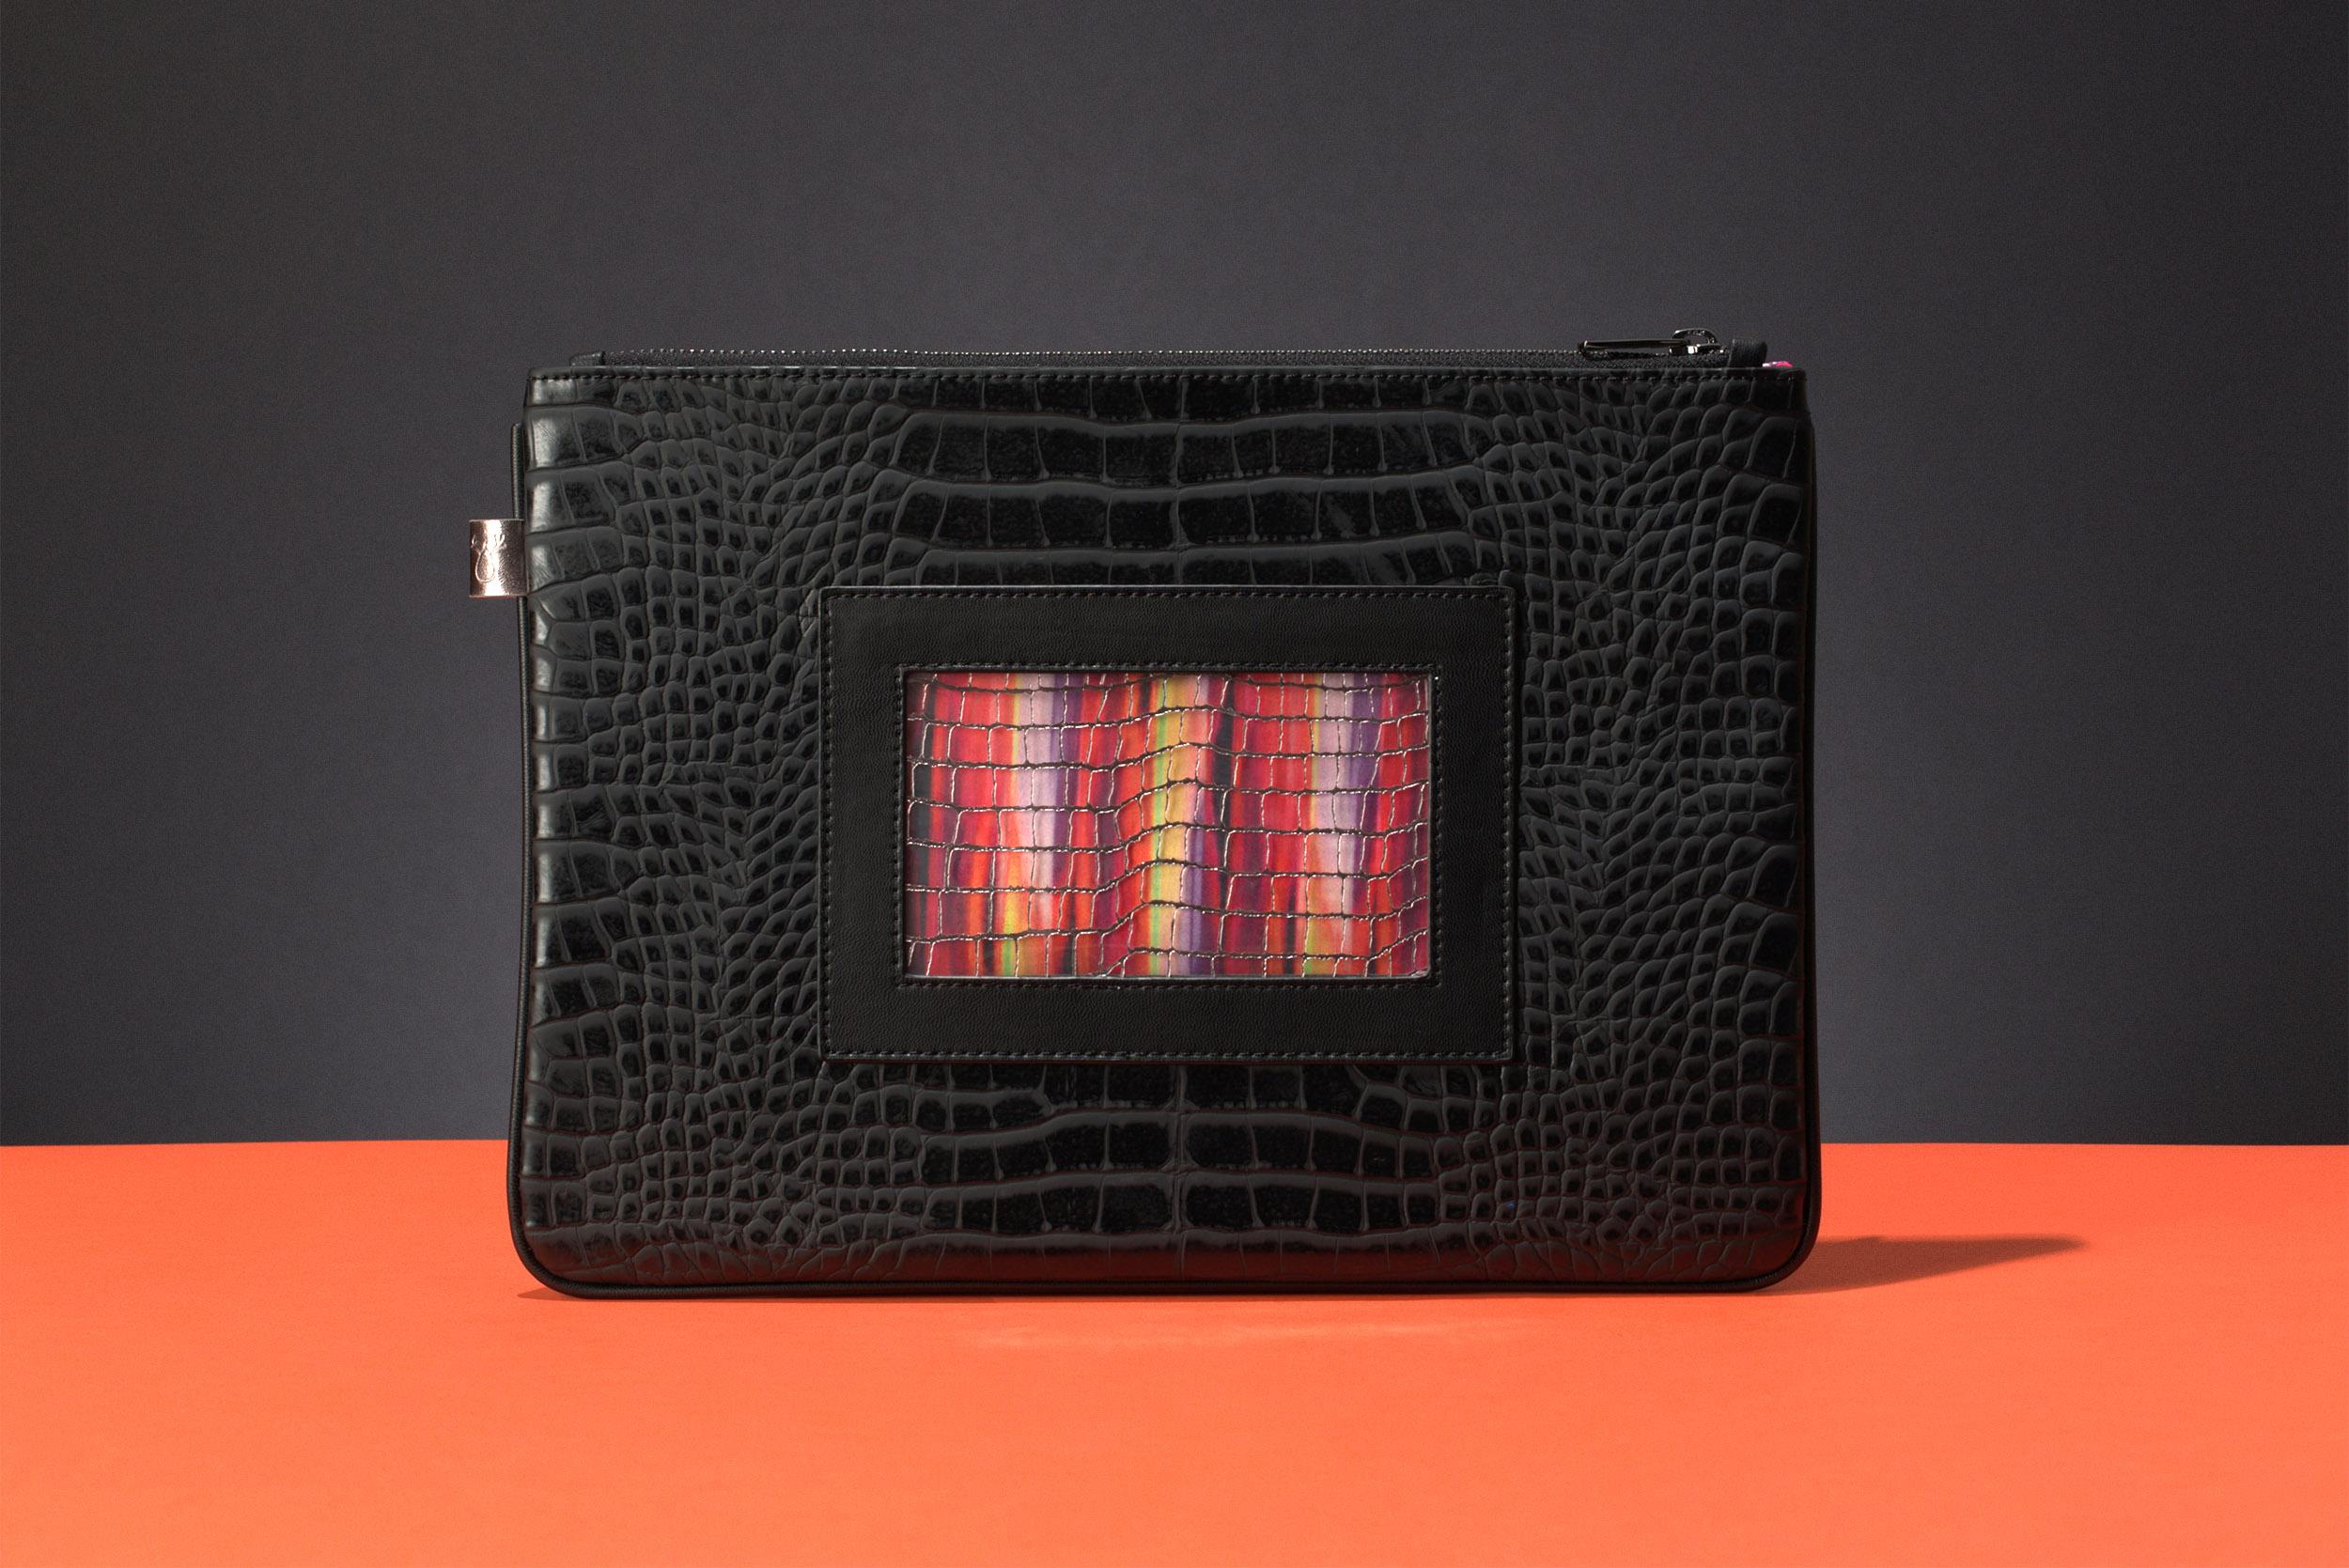 FruitenVeg-GEMA bag-luxury-vegan-leather-black-large-Ipad bag-bracelet-clutch-new-york-handbag-designer